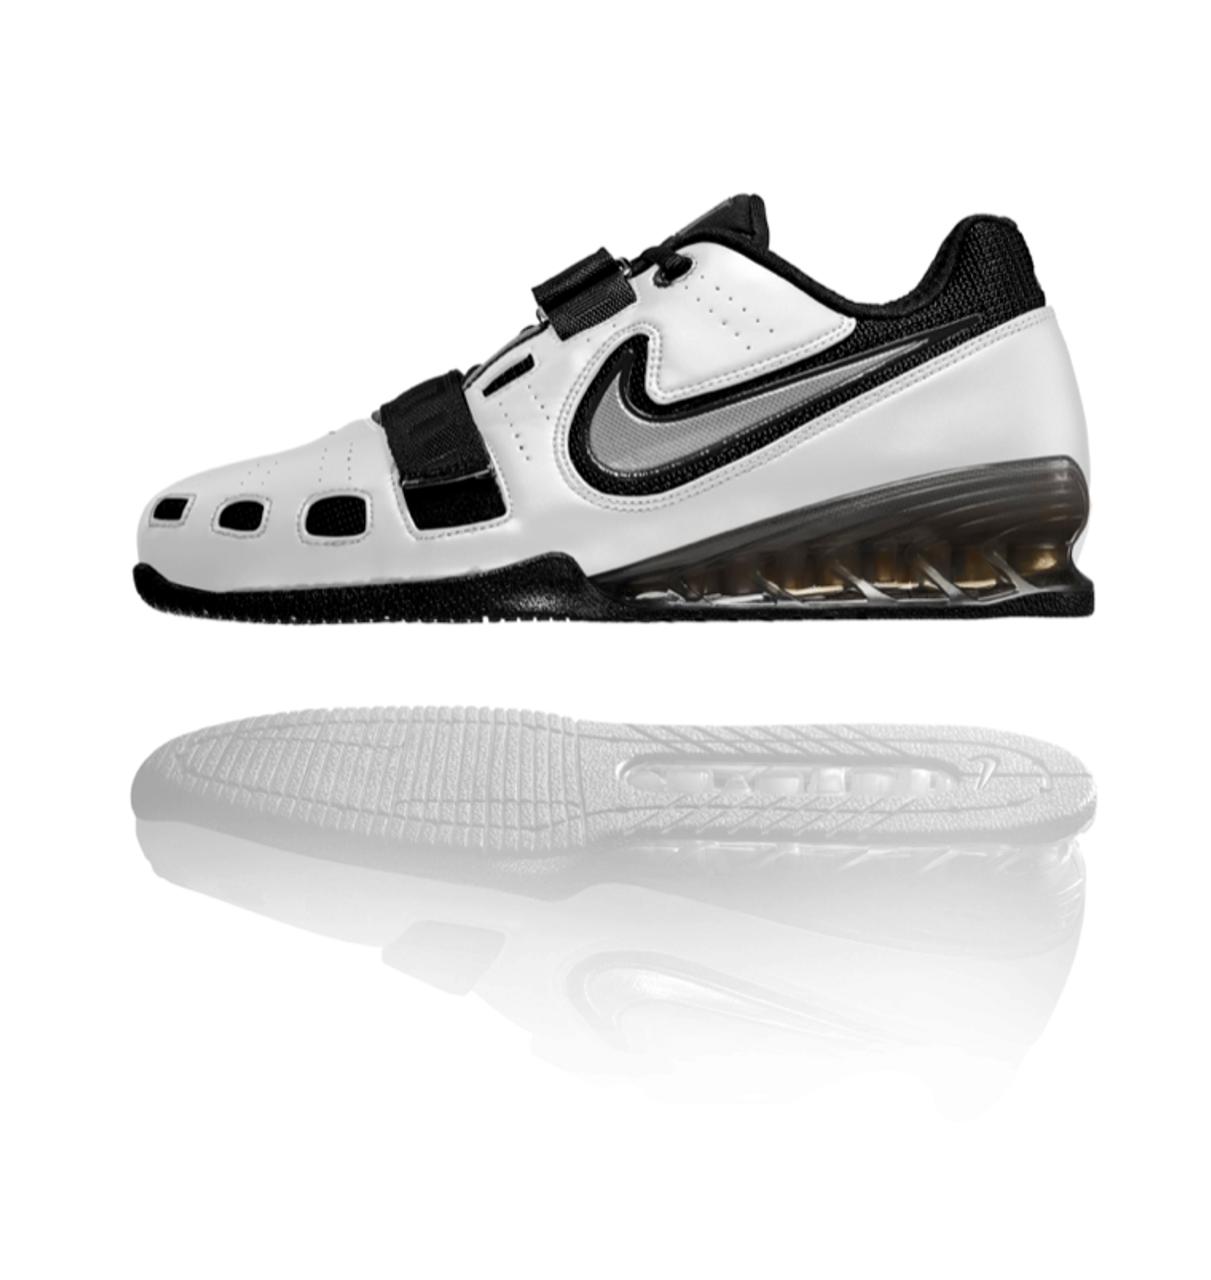 2960dafa5a68a6 Nike Romaleos 2 Weightlifting Shoes White   Charcoal Grey